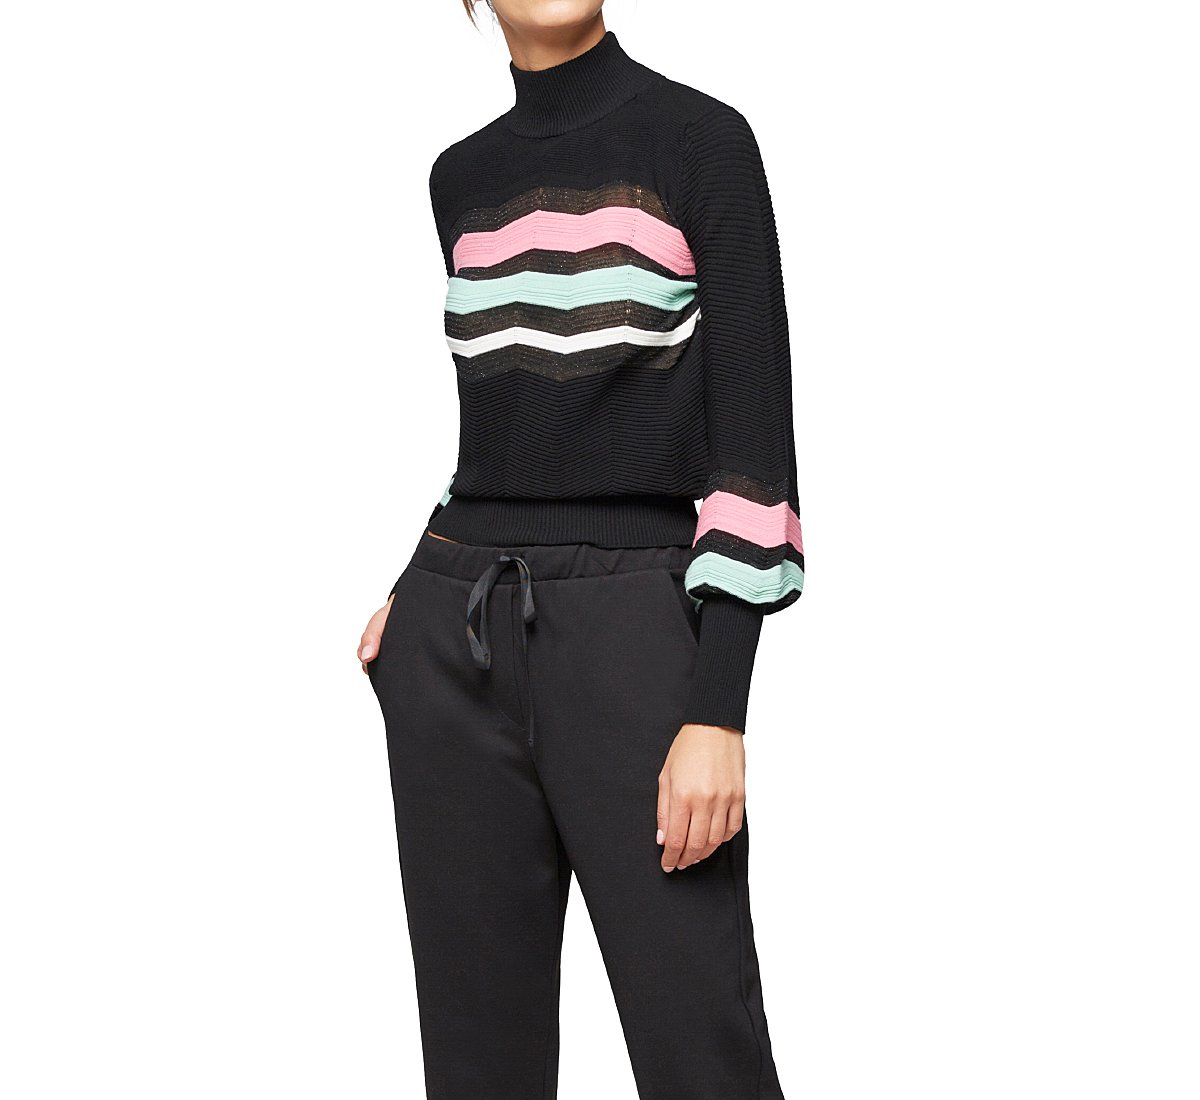 Viscose turtleneck sweater